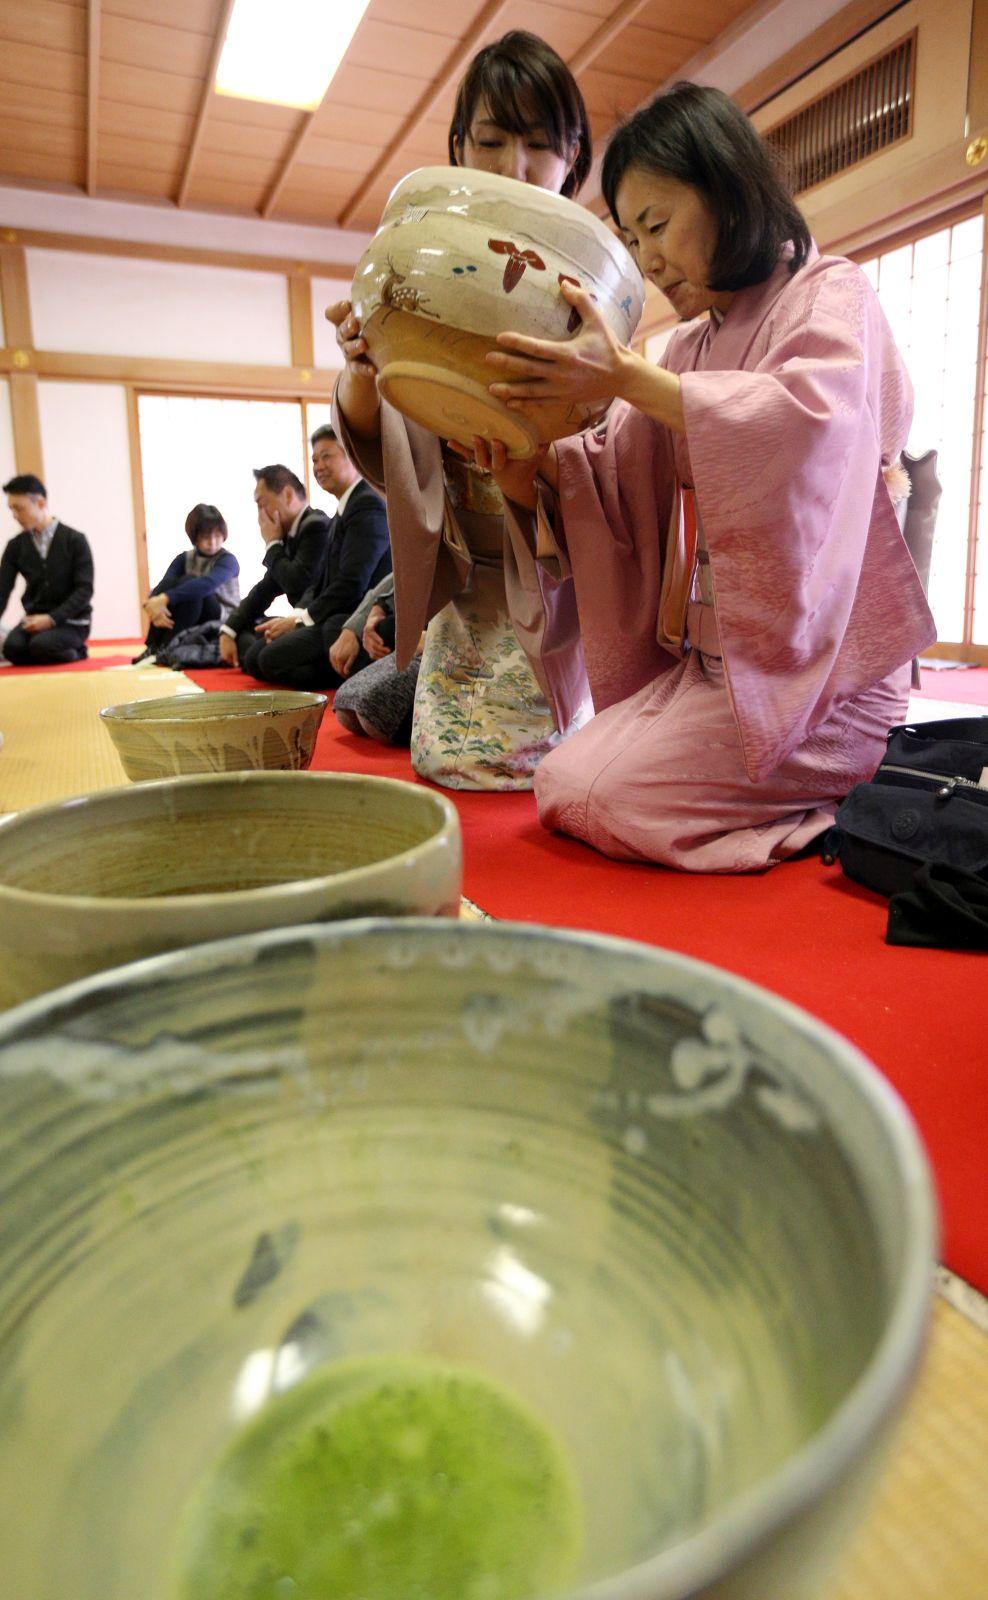 [Hidden Wonders of Japan] In This Tea Ceremony, A 5-kg Bowl Is Passed Around